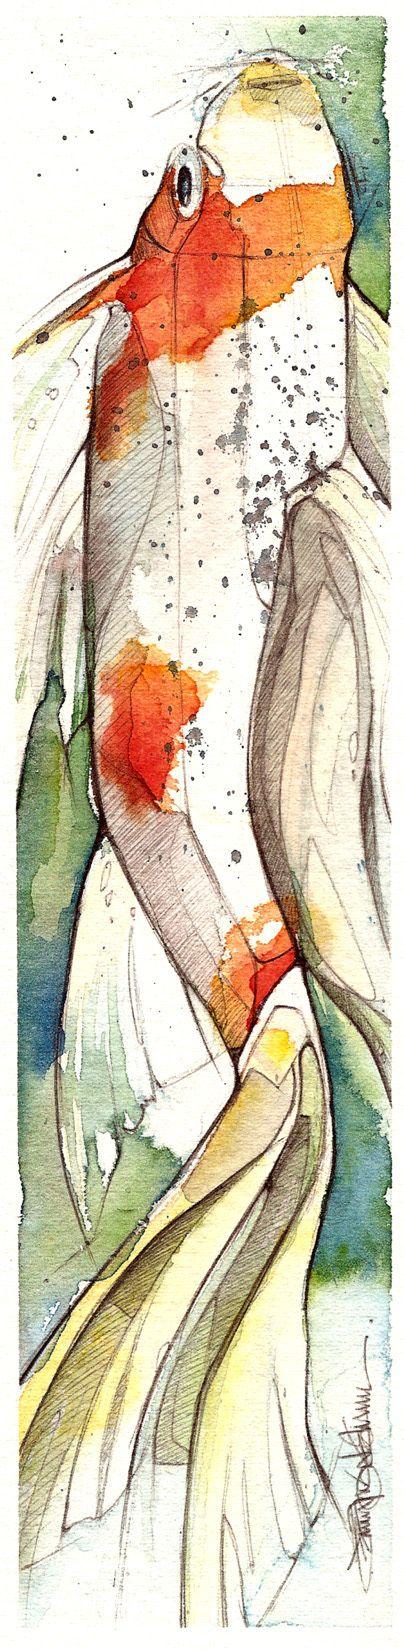 Koi by Jennifer Kraska, via Behance